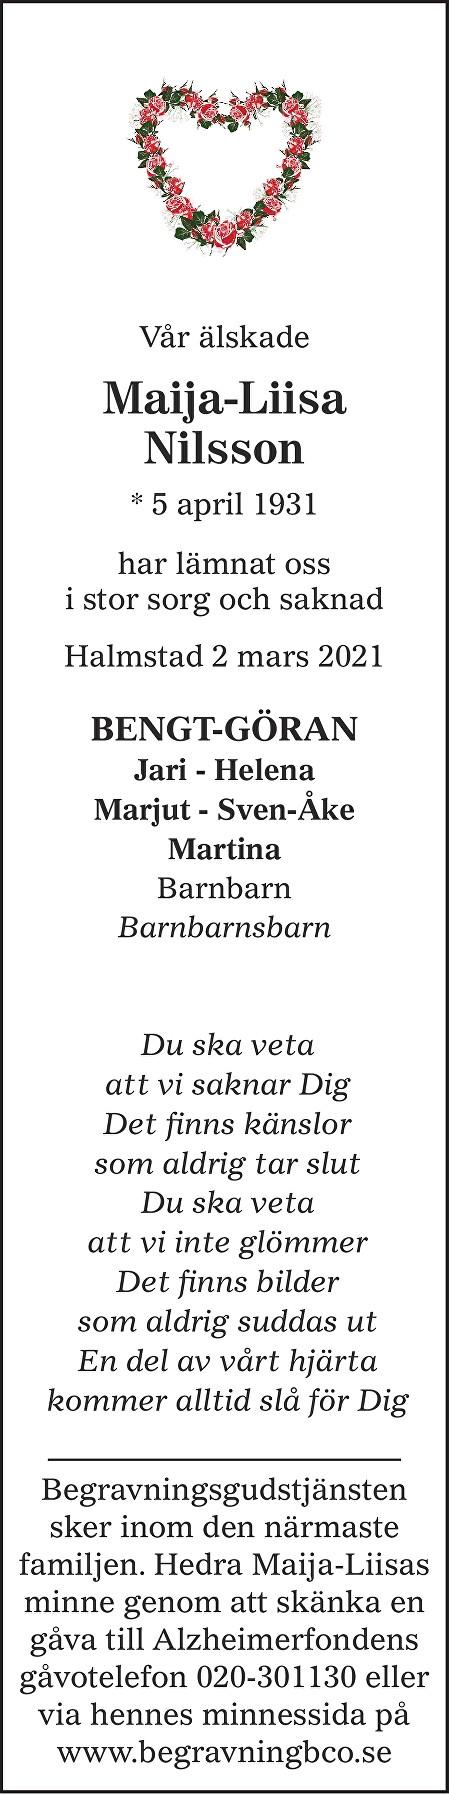 Maija-Liisa Nilsson Death notice